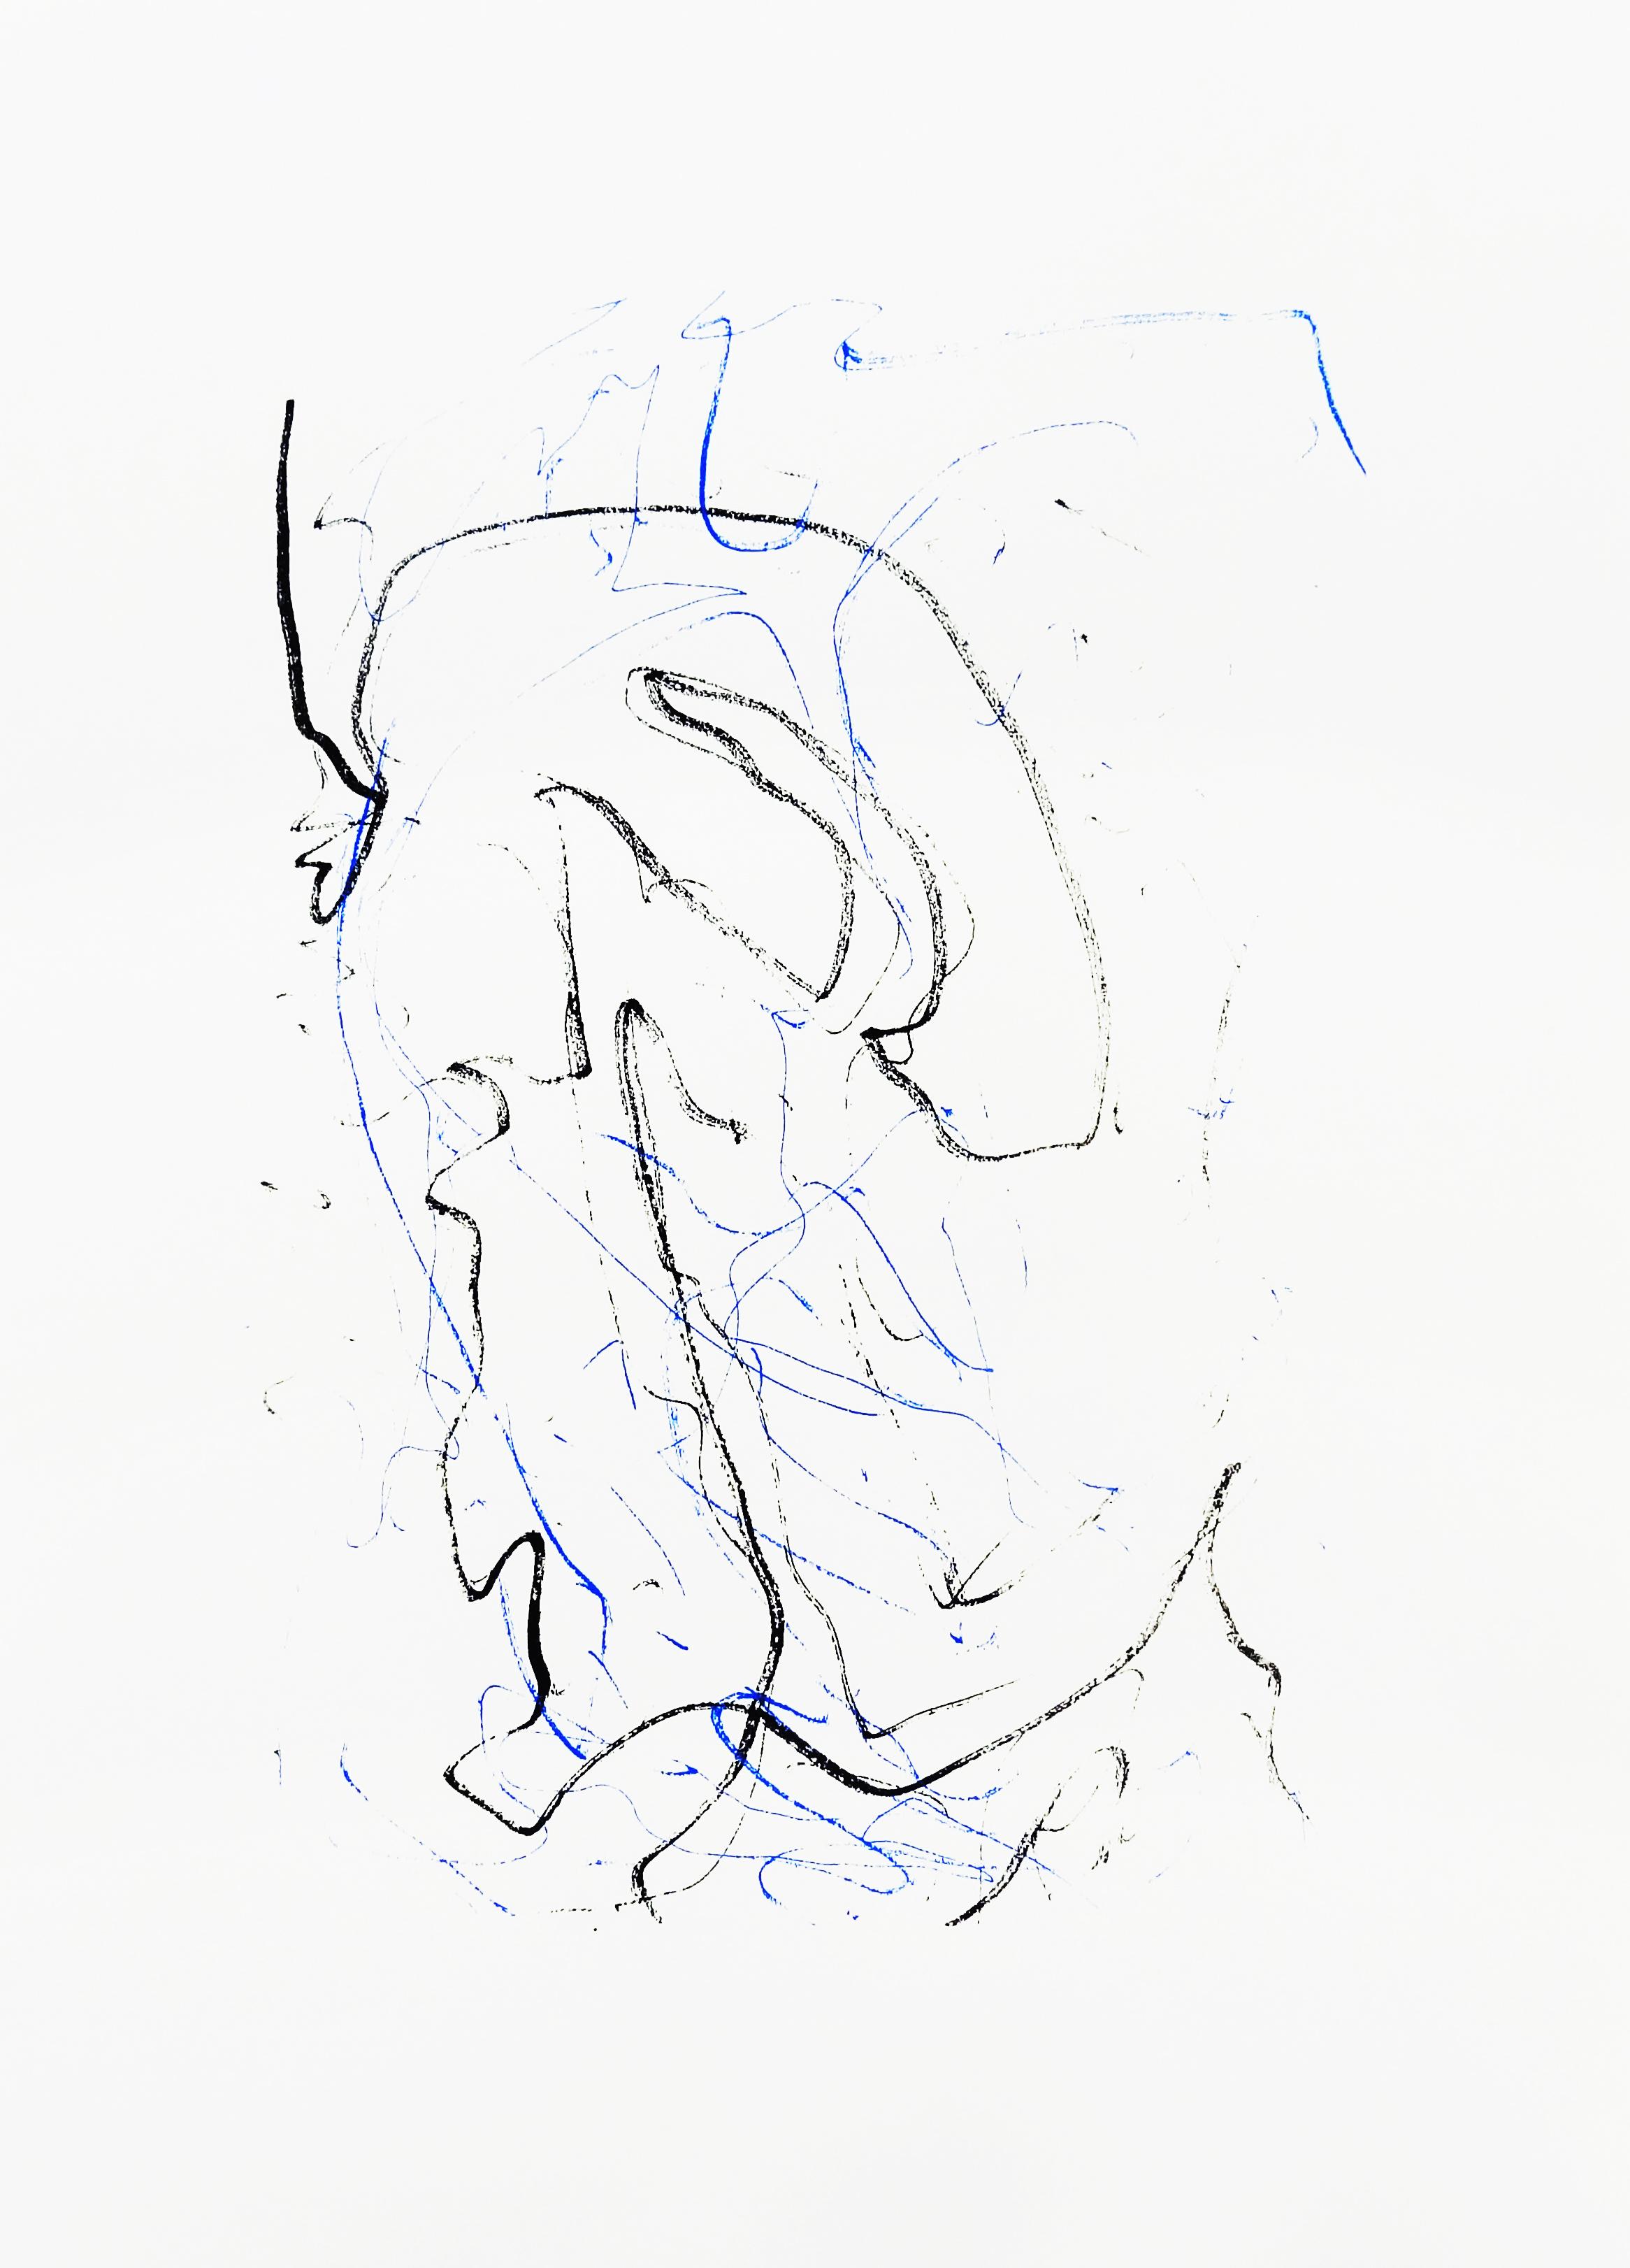 Untitled, 2015 acrylic on paper one-off screenprint 42,0 x 29,7 cm (4-15)